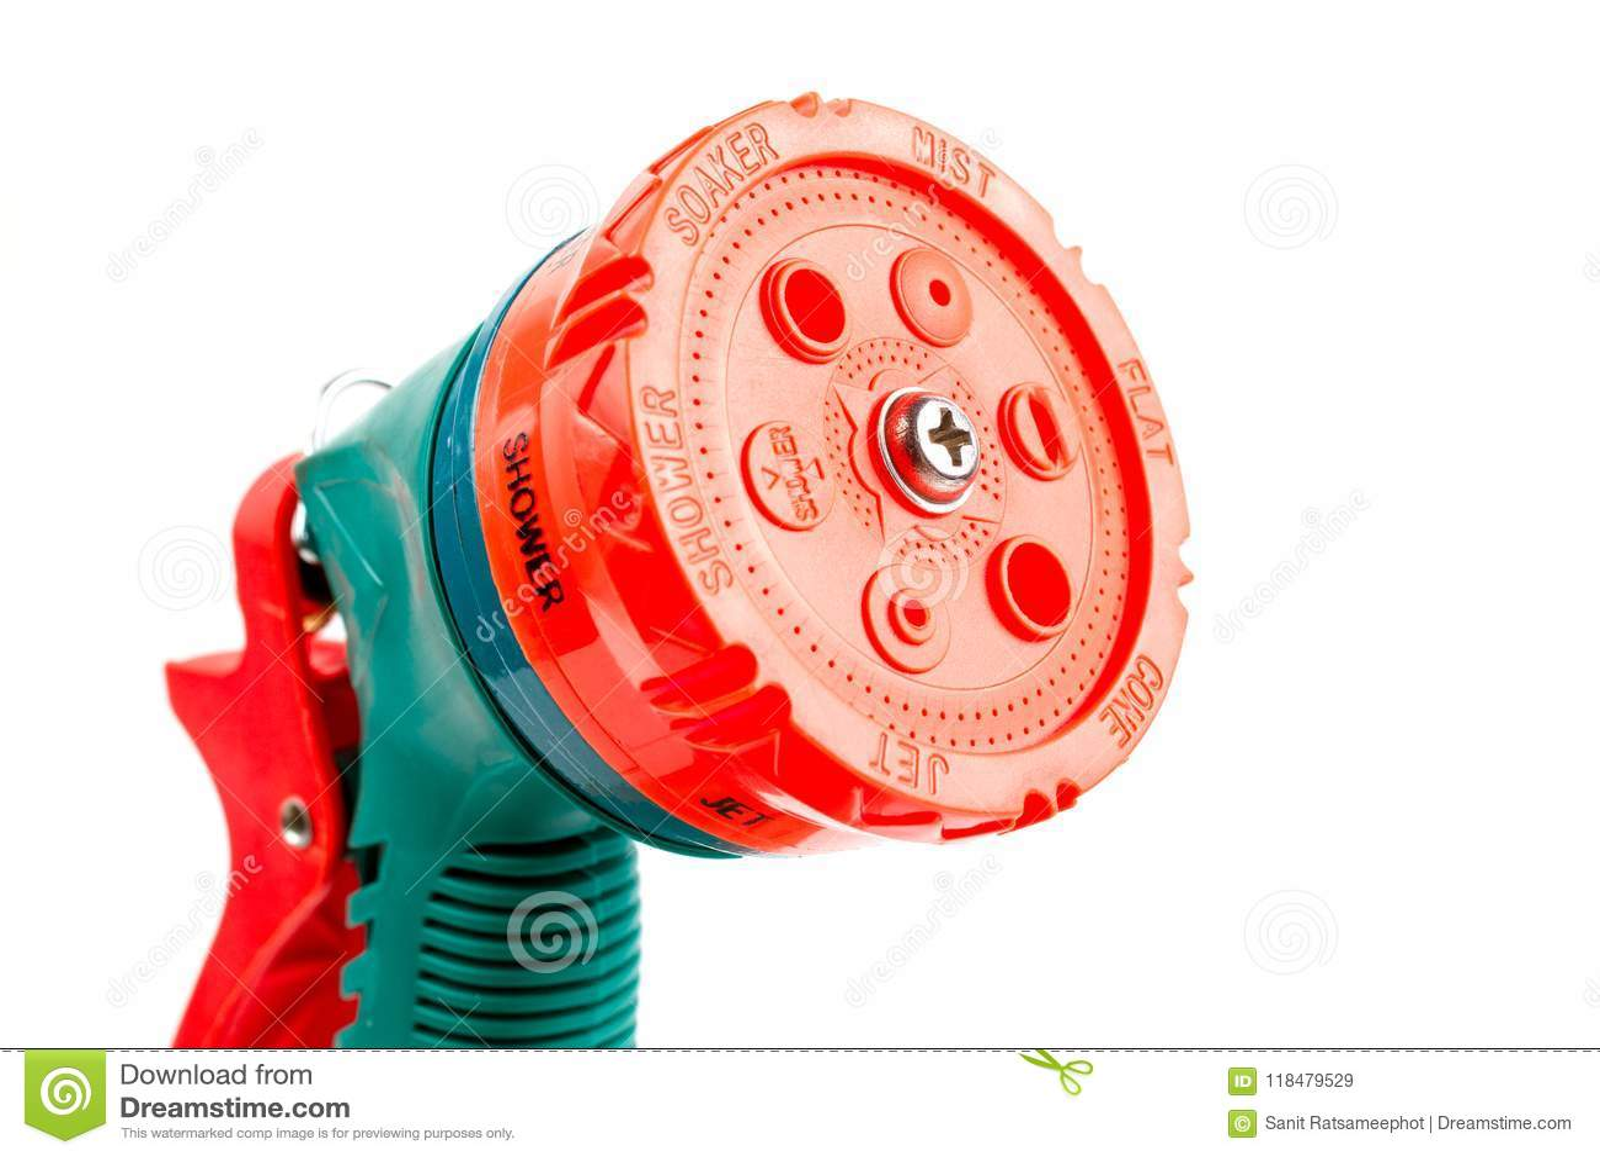 Green Plastic Watering Garden Hose Sprayer.